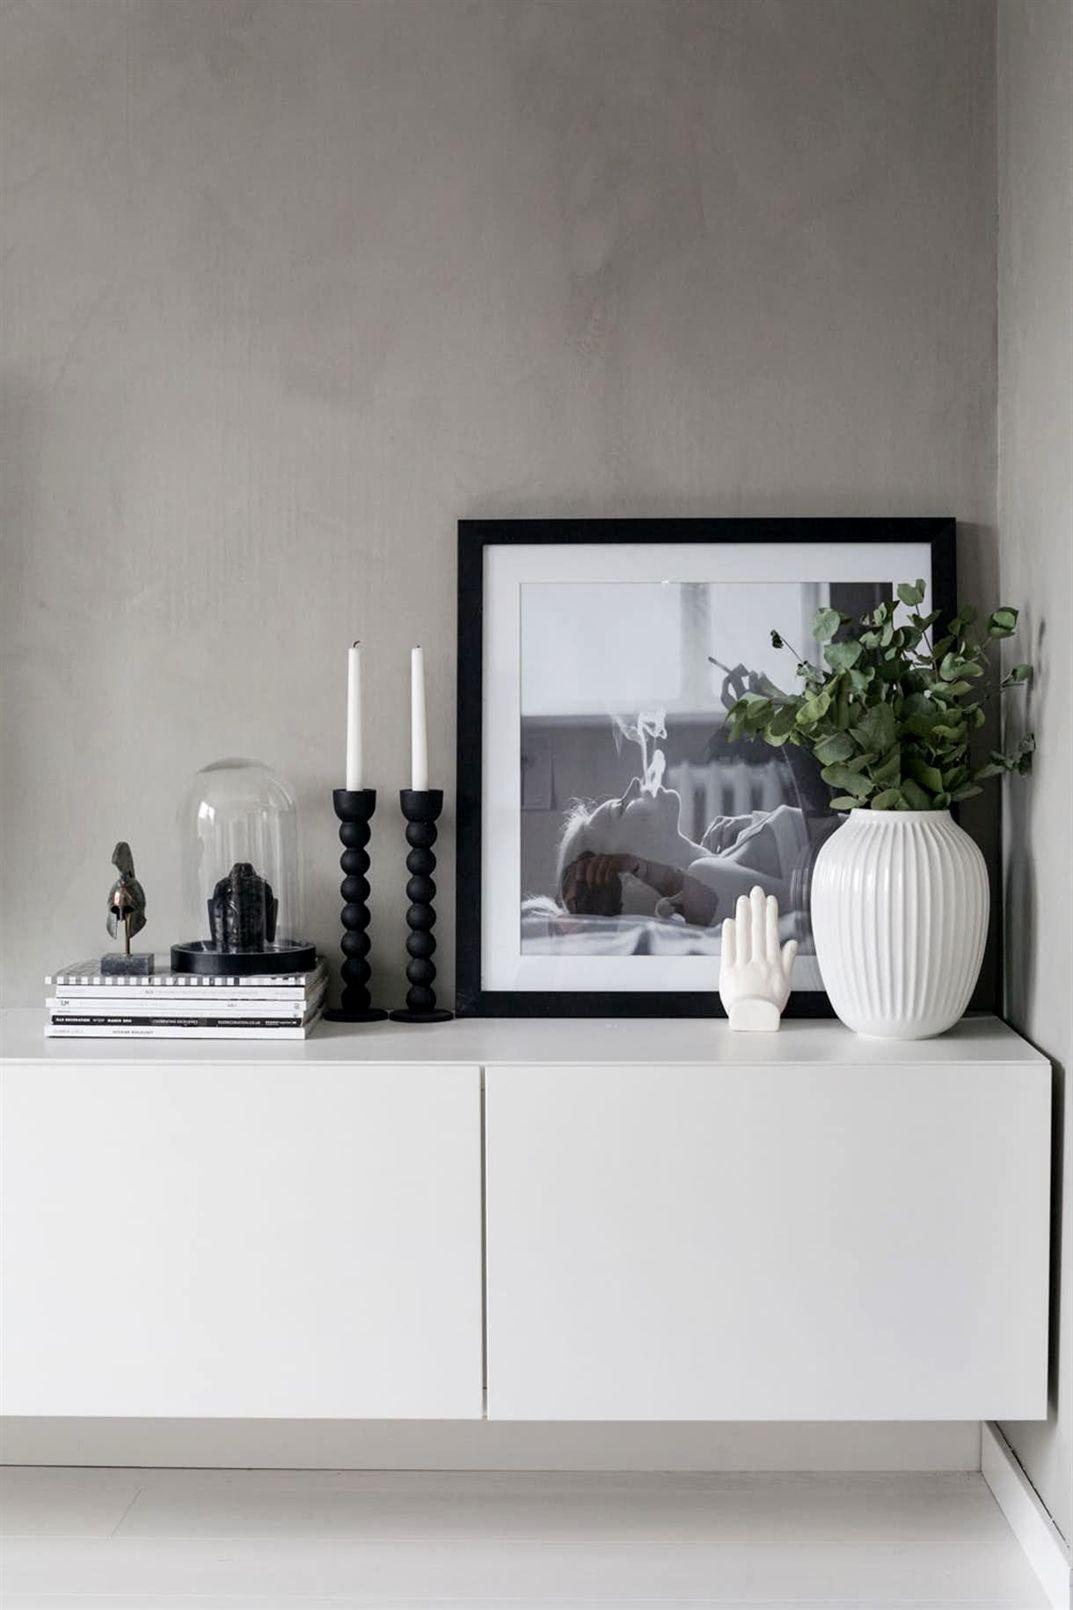 How To Choose A Rush Rug Inredning Vardagsrum Inspiration Ikea Ideer Vardagsrum